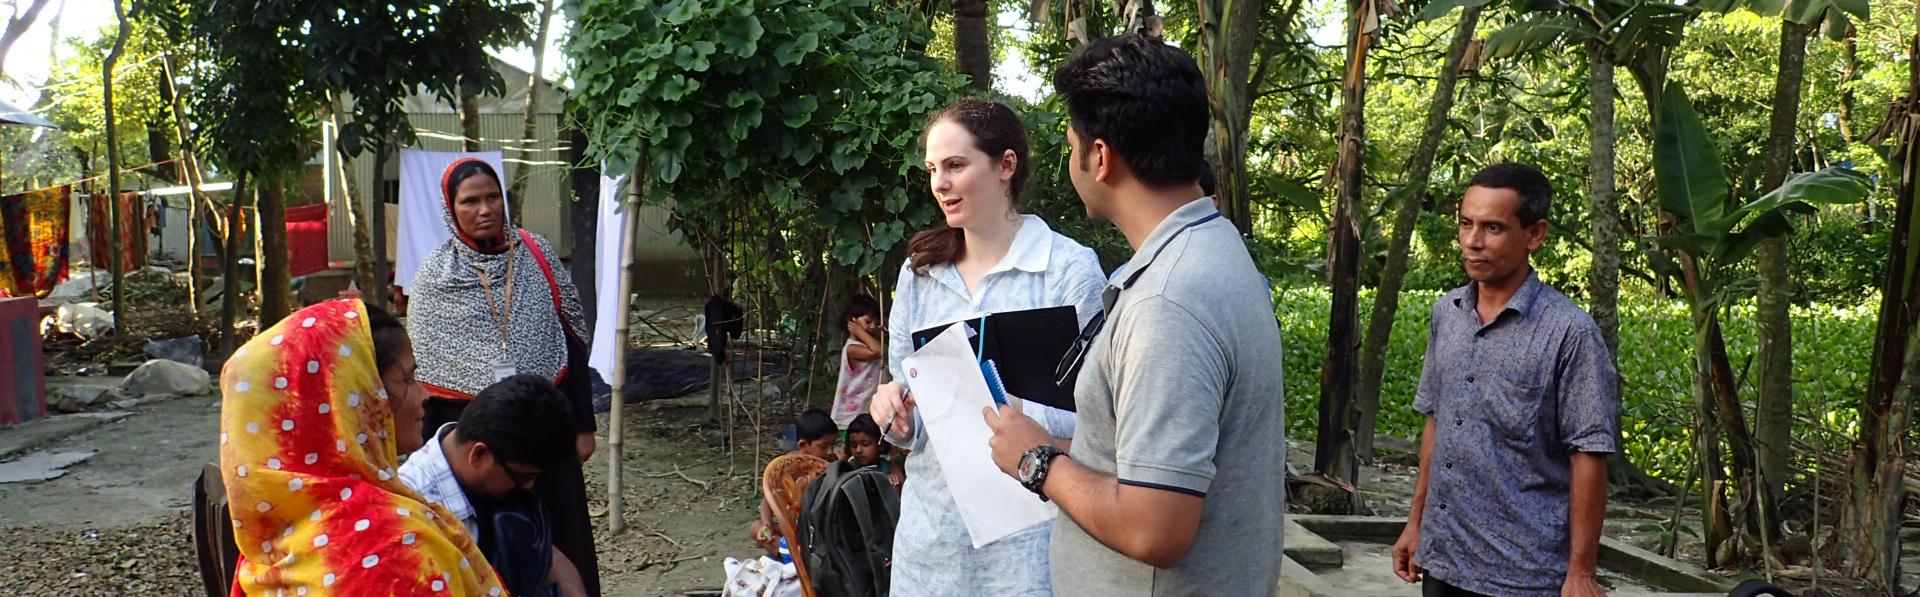 Saskia Nowicki leading field work in Matlab, Bangladesh